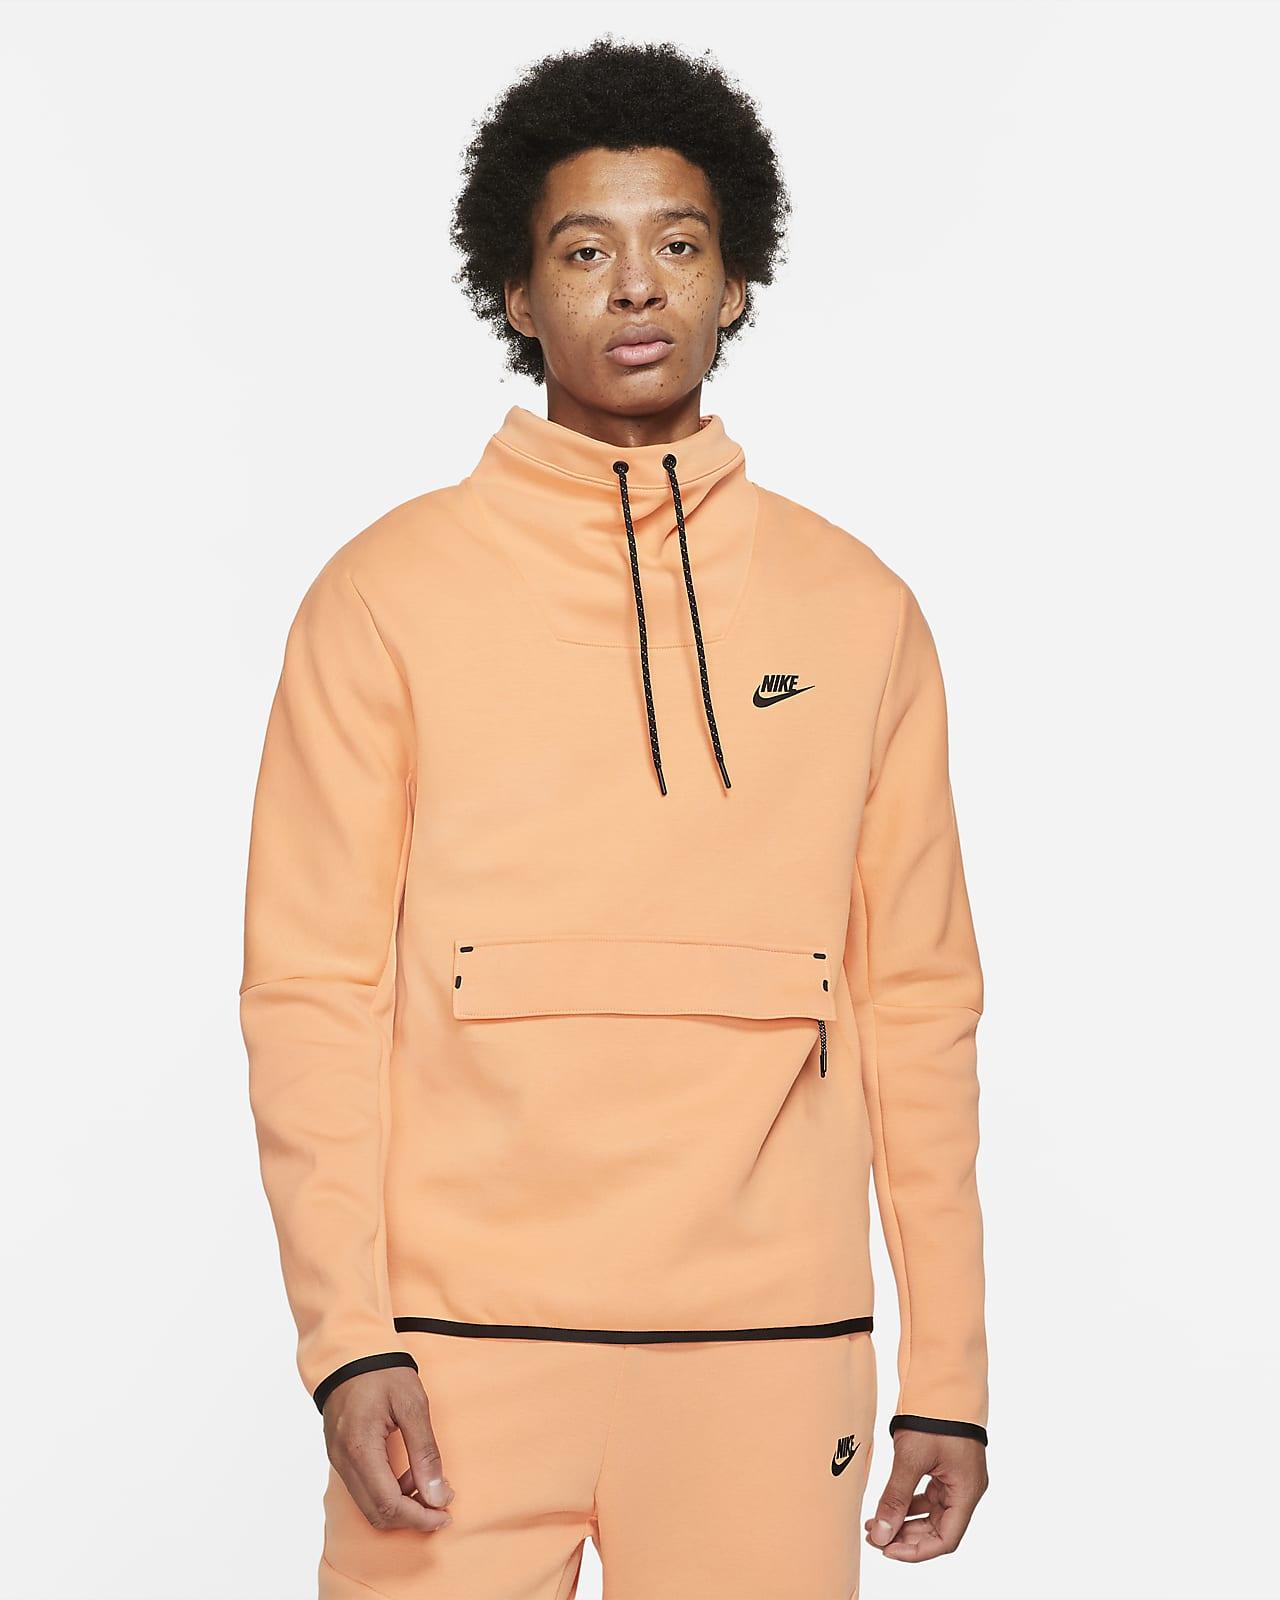 Nike Sportswear Tech Fleece Part superior de coll d'embut de màniga llarga - Home